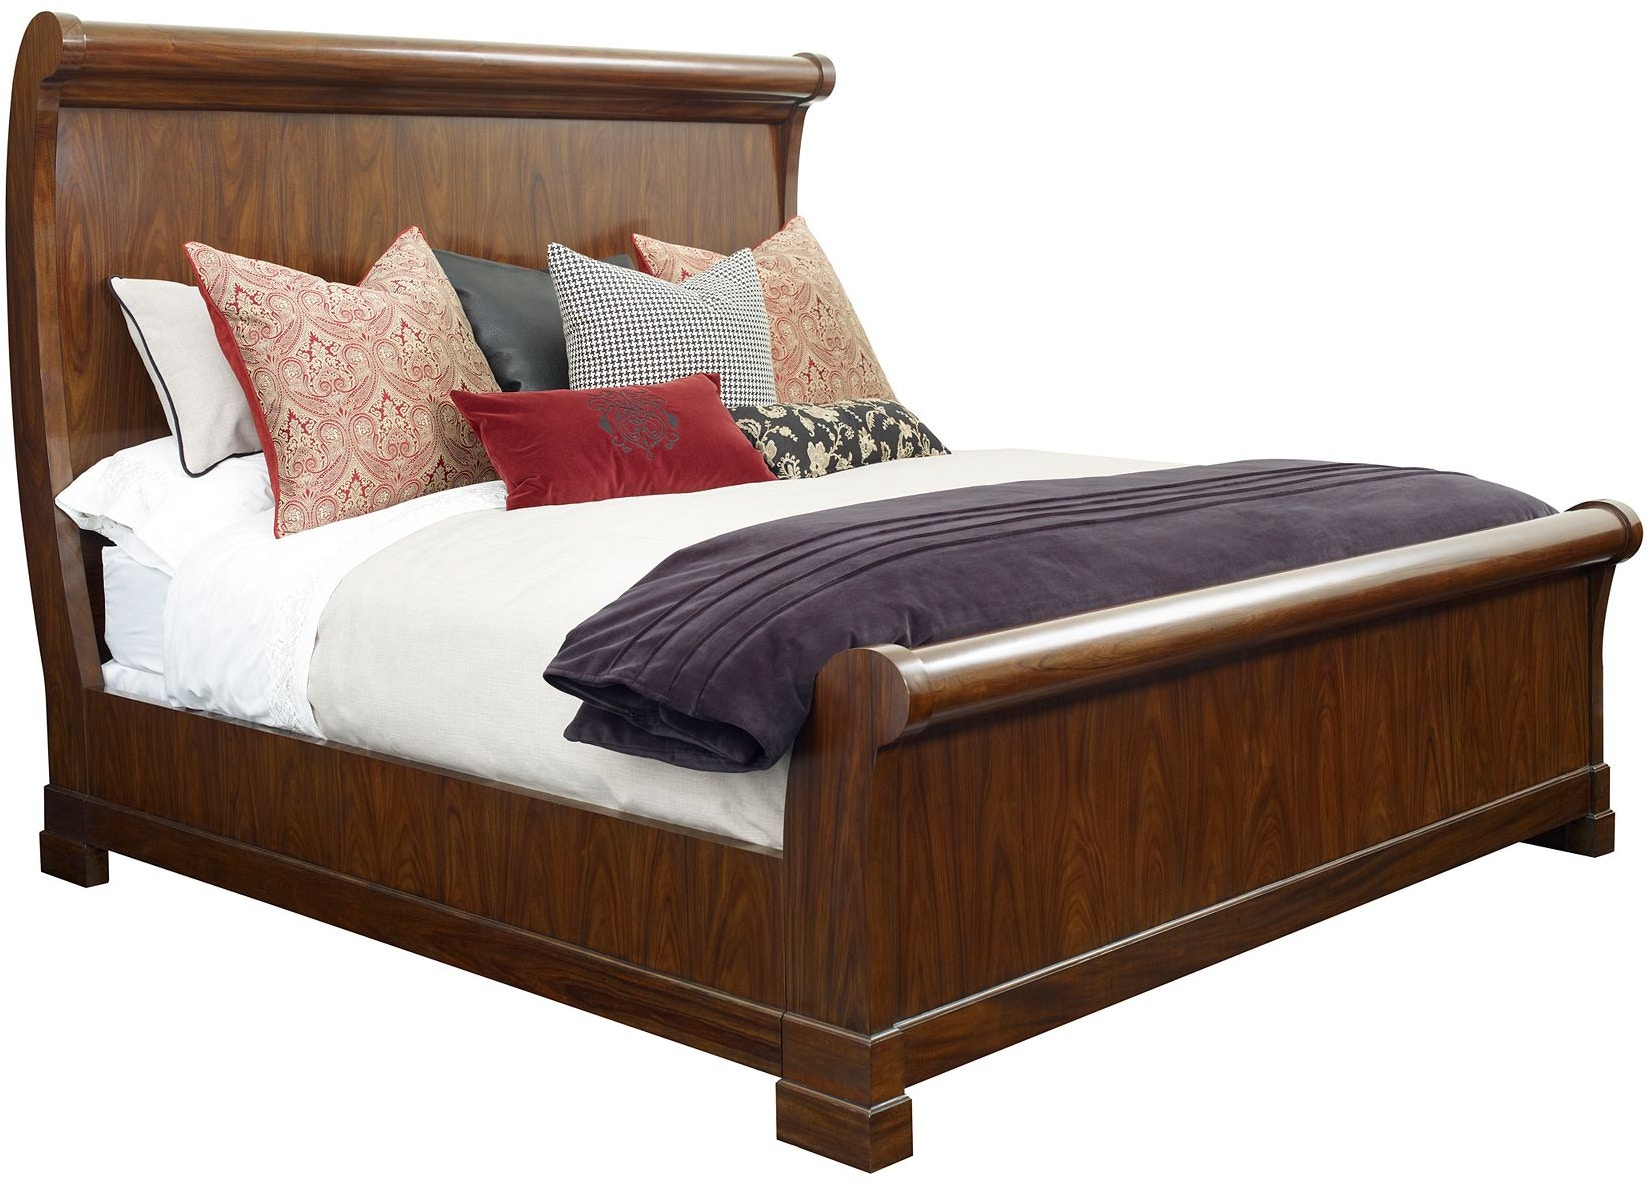 Henredon Furniture 4200-12-399HF / 4200-12-399R Bedroom Modern ...